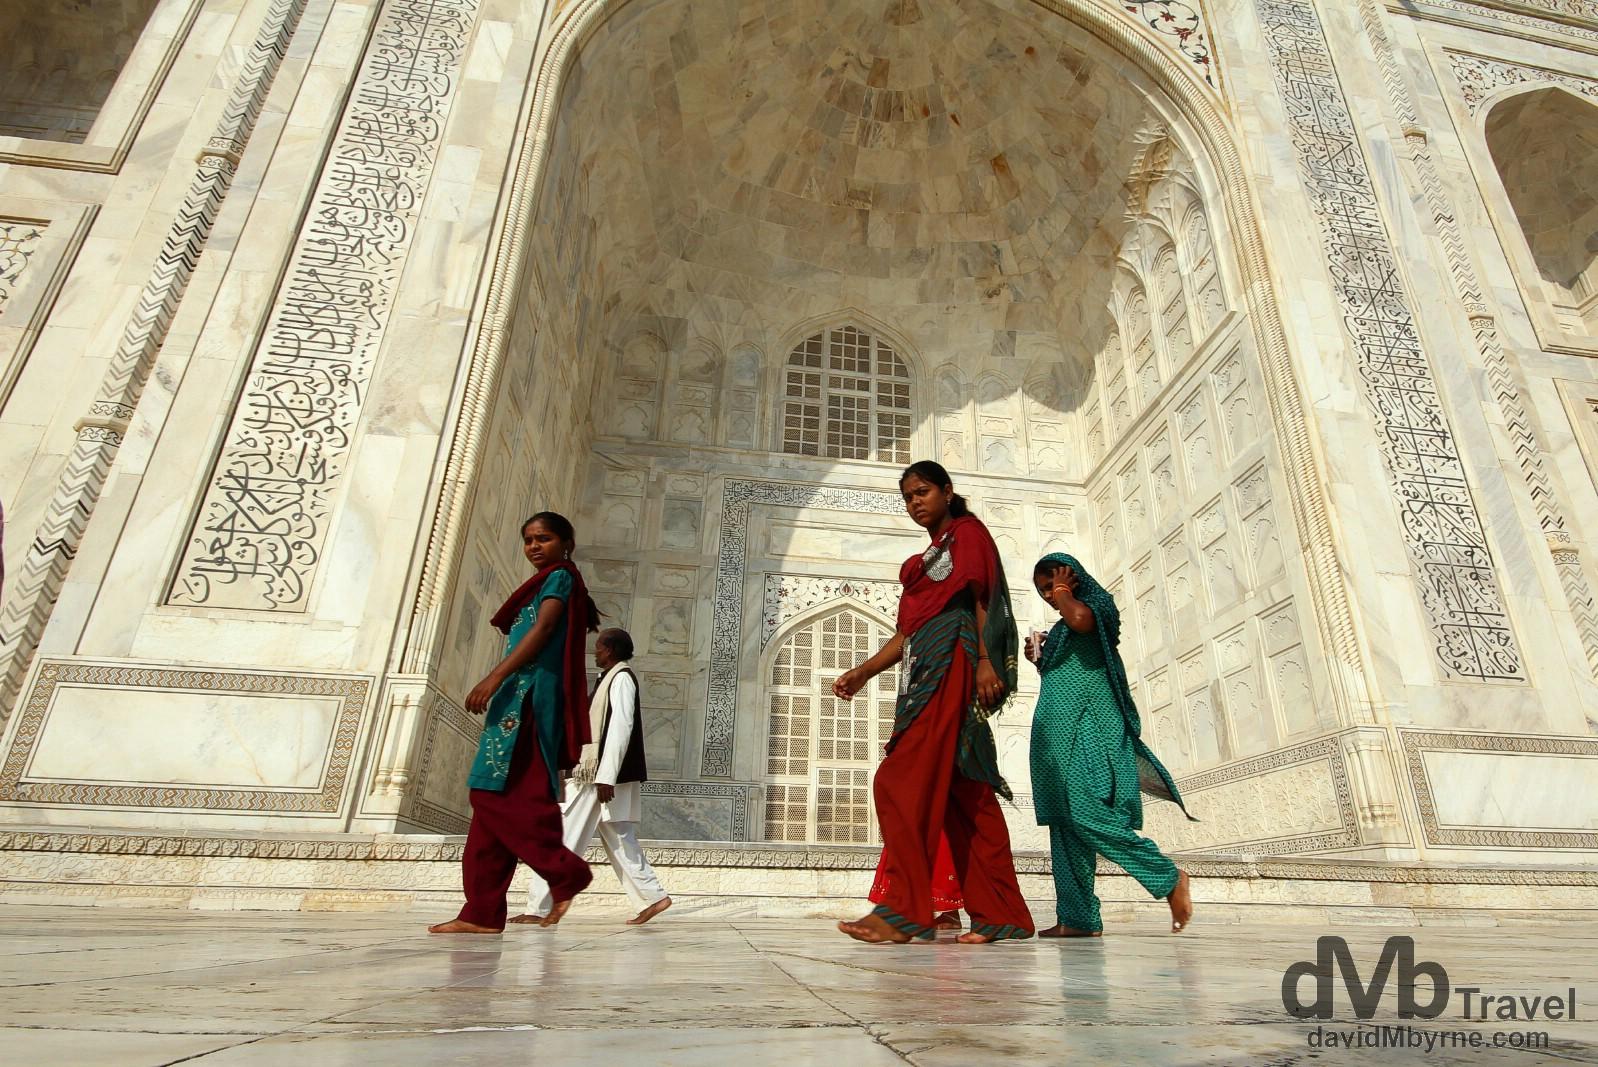 Walking on the raised marble platform surrounding the Taj Mahal in Agra, Uttar Pradesh, India. October 11th 2012.